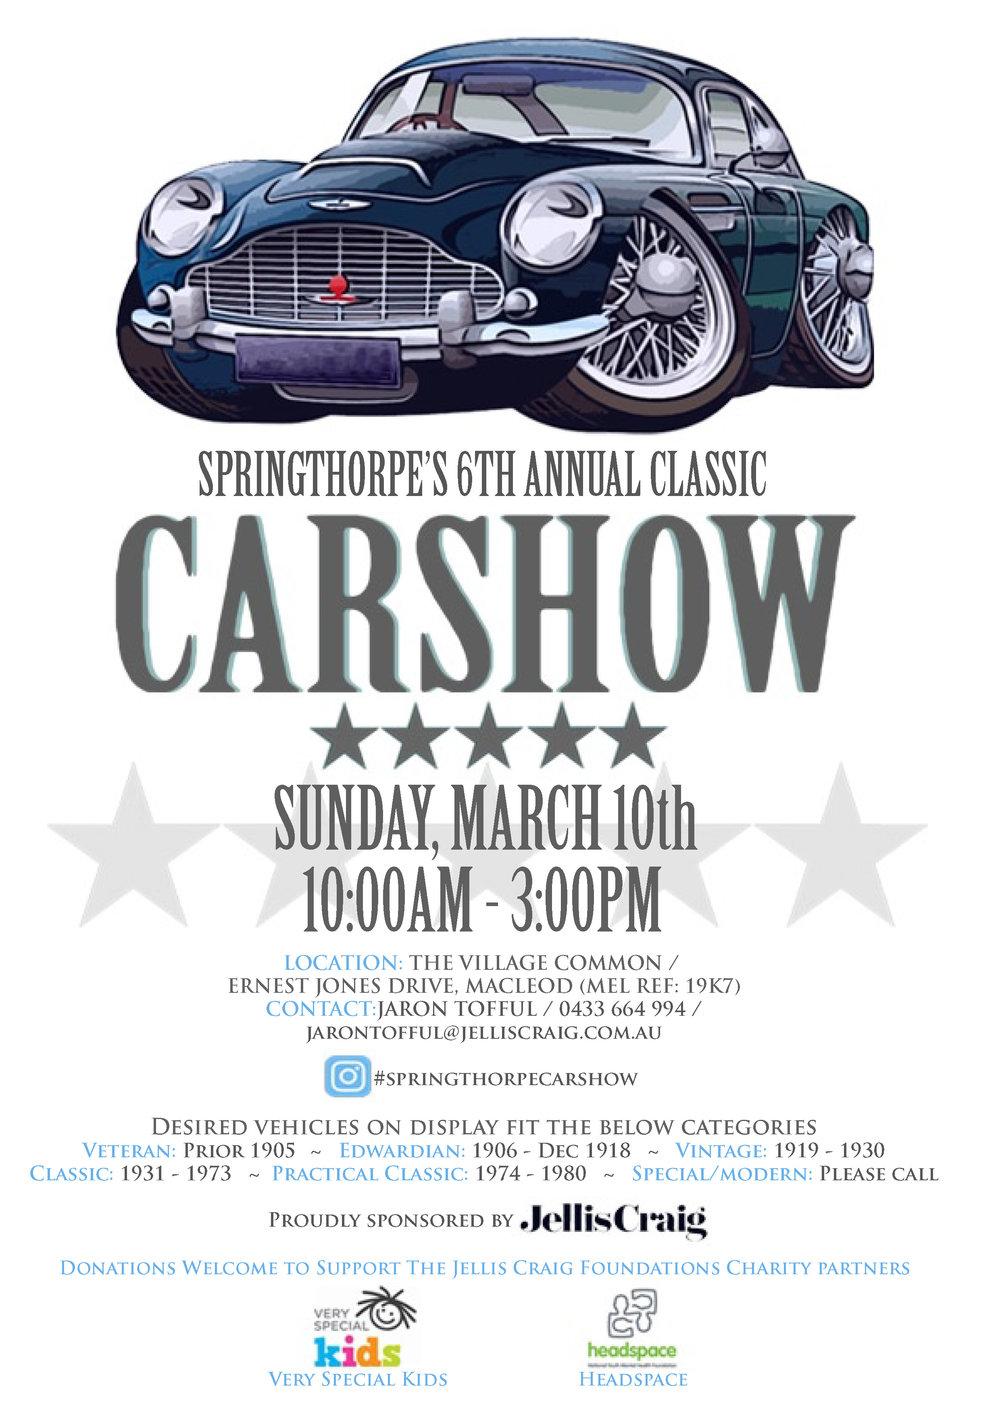 Springthorpe's Annual Classic Car Show.jpg